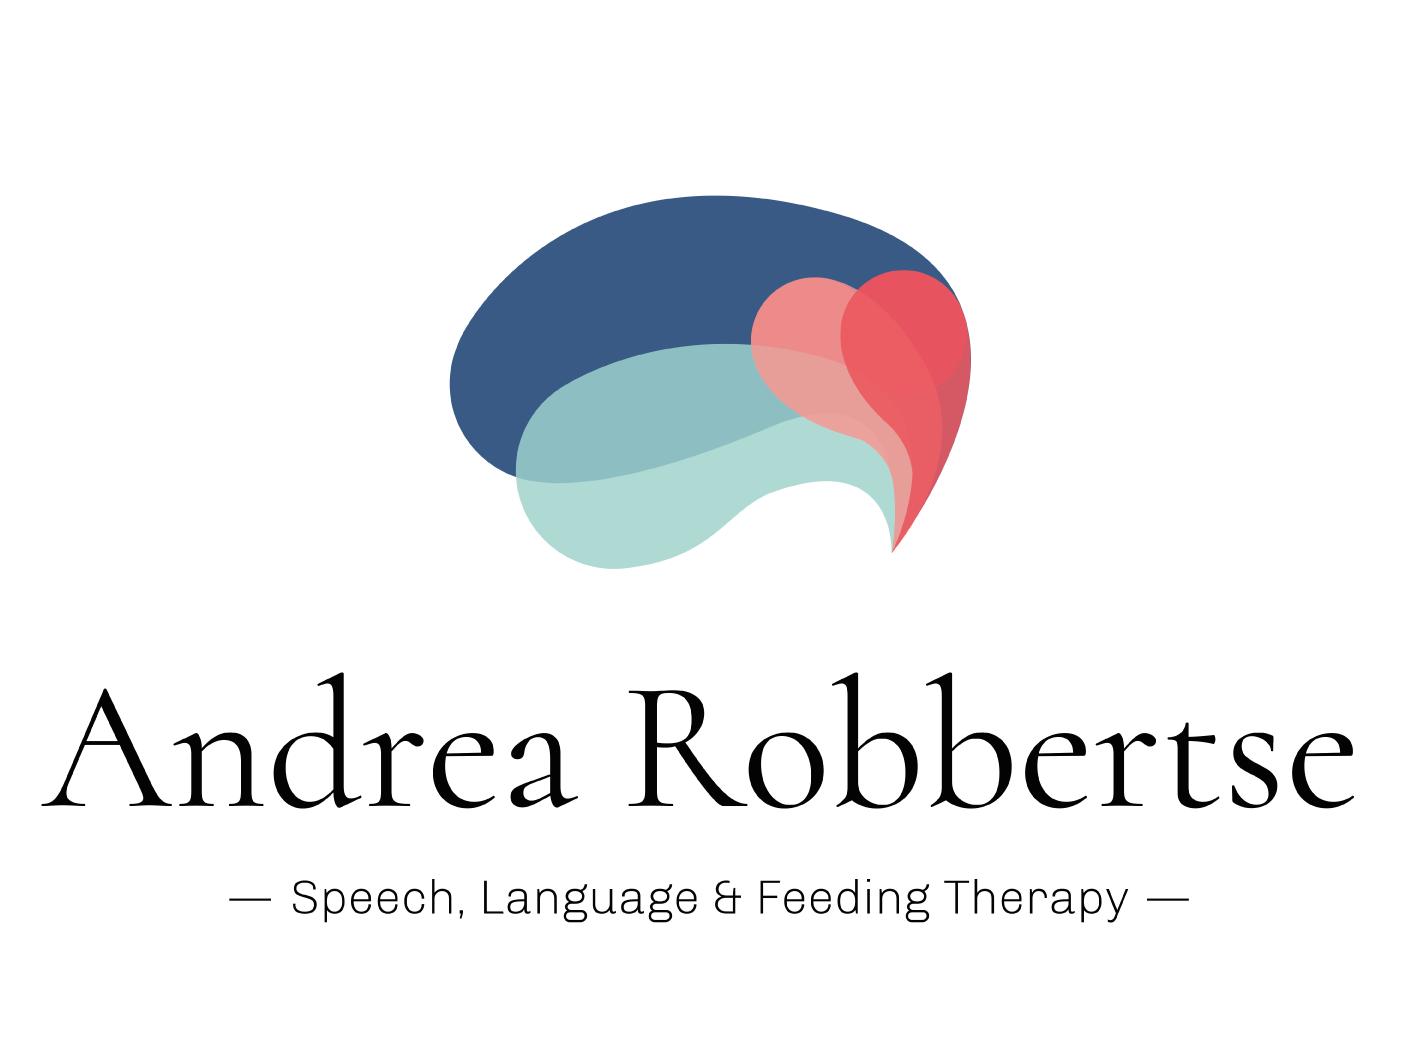 Speech Therapy Logo by Nicole Pretorius on Dribbble.